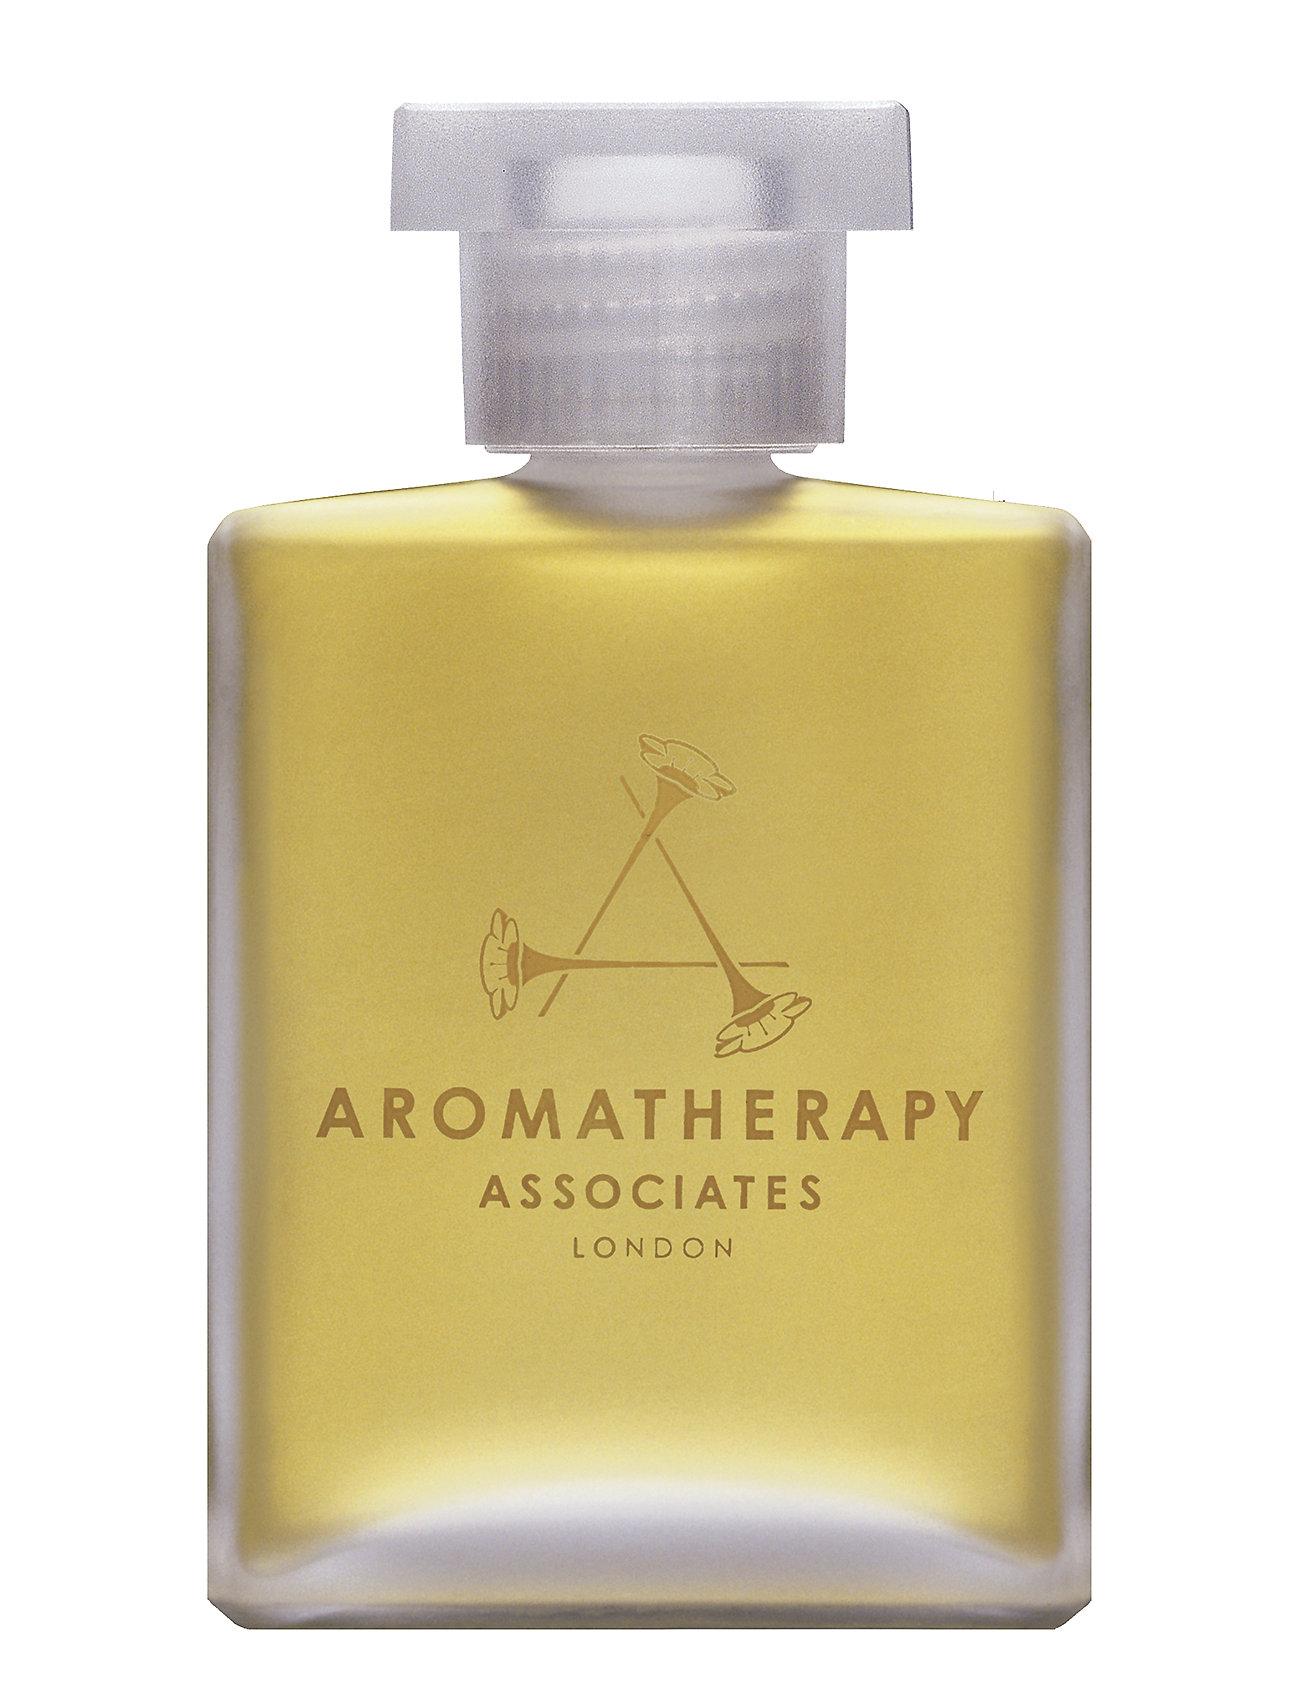 Aromatherapy Associates INNER STRENGTH BATH & SHOWER OIL - CLEAR